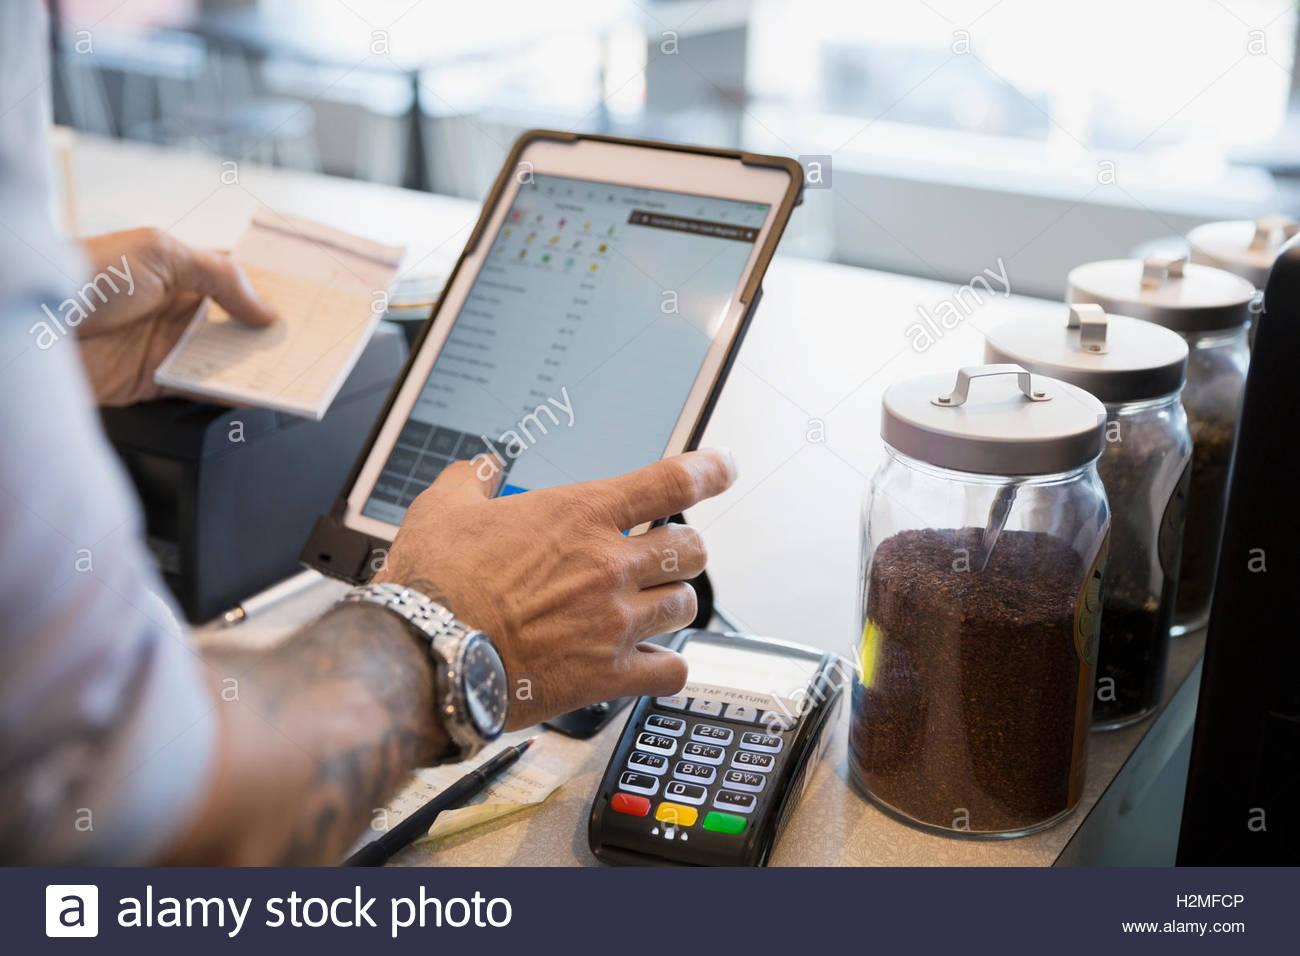 Male cafe owner holding check using digital tablet at cash